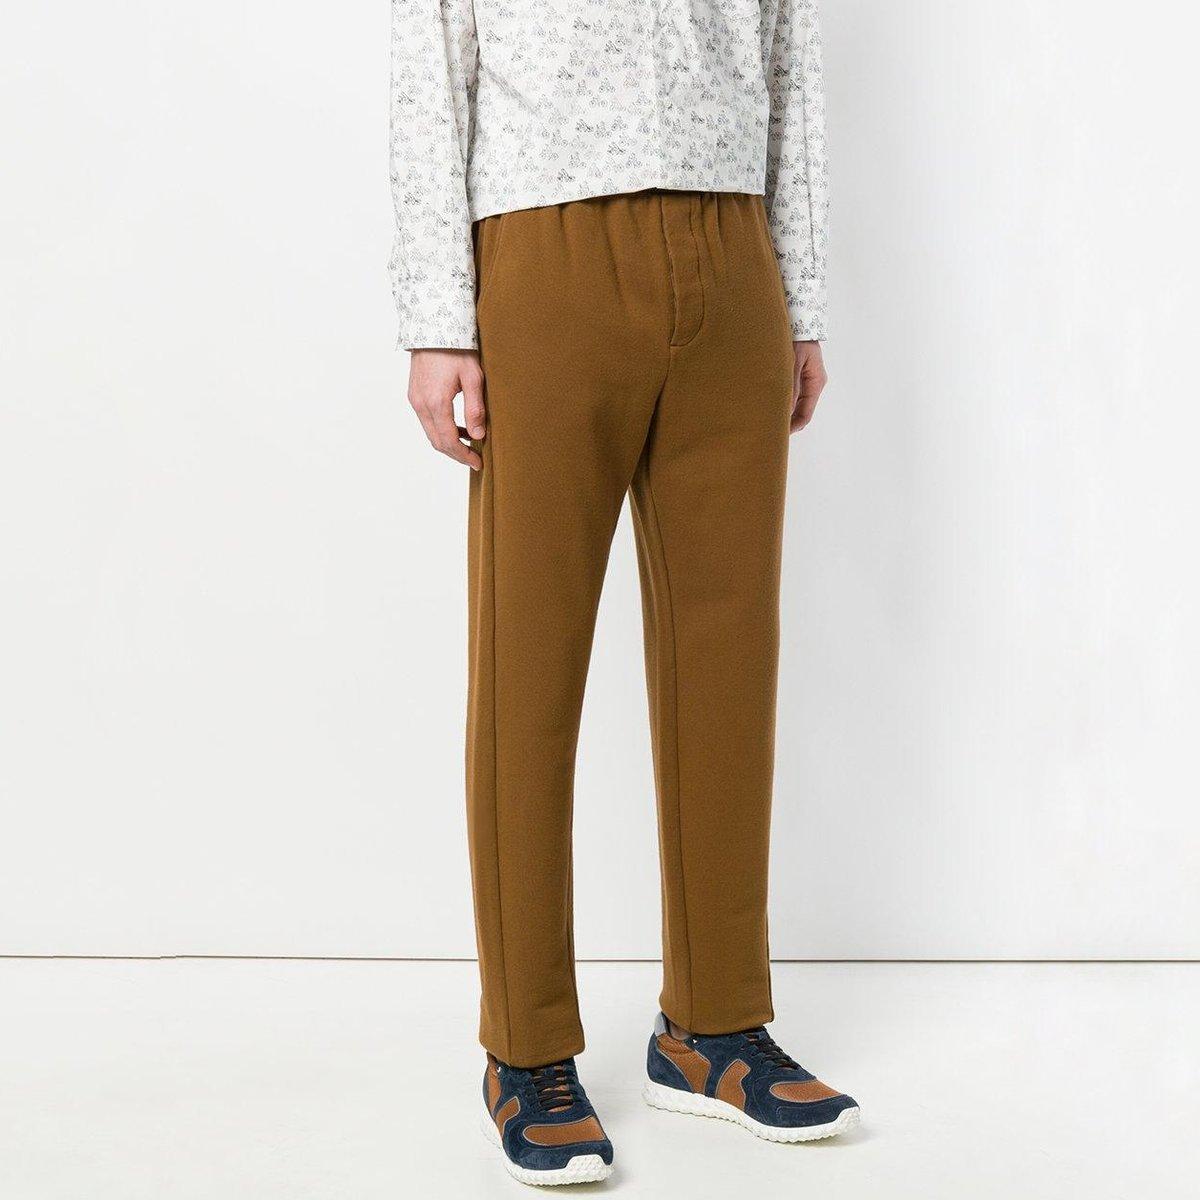 marni-Brown-Tailored-Track-Pants (2).jpg